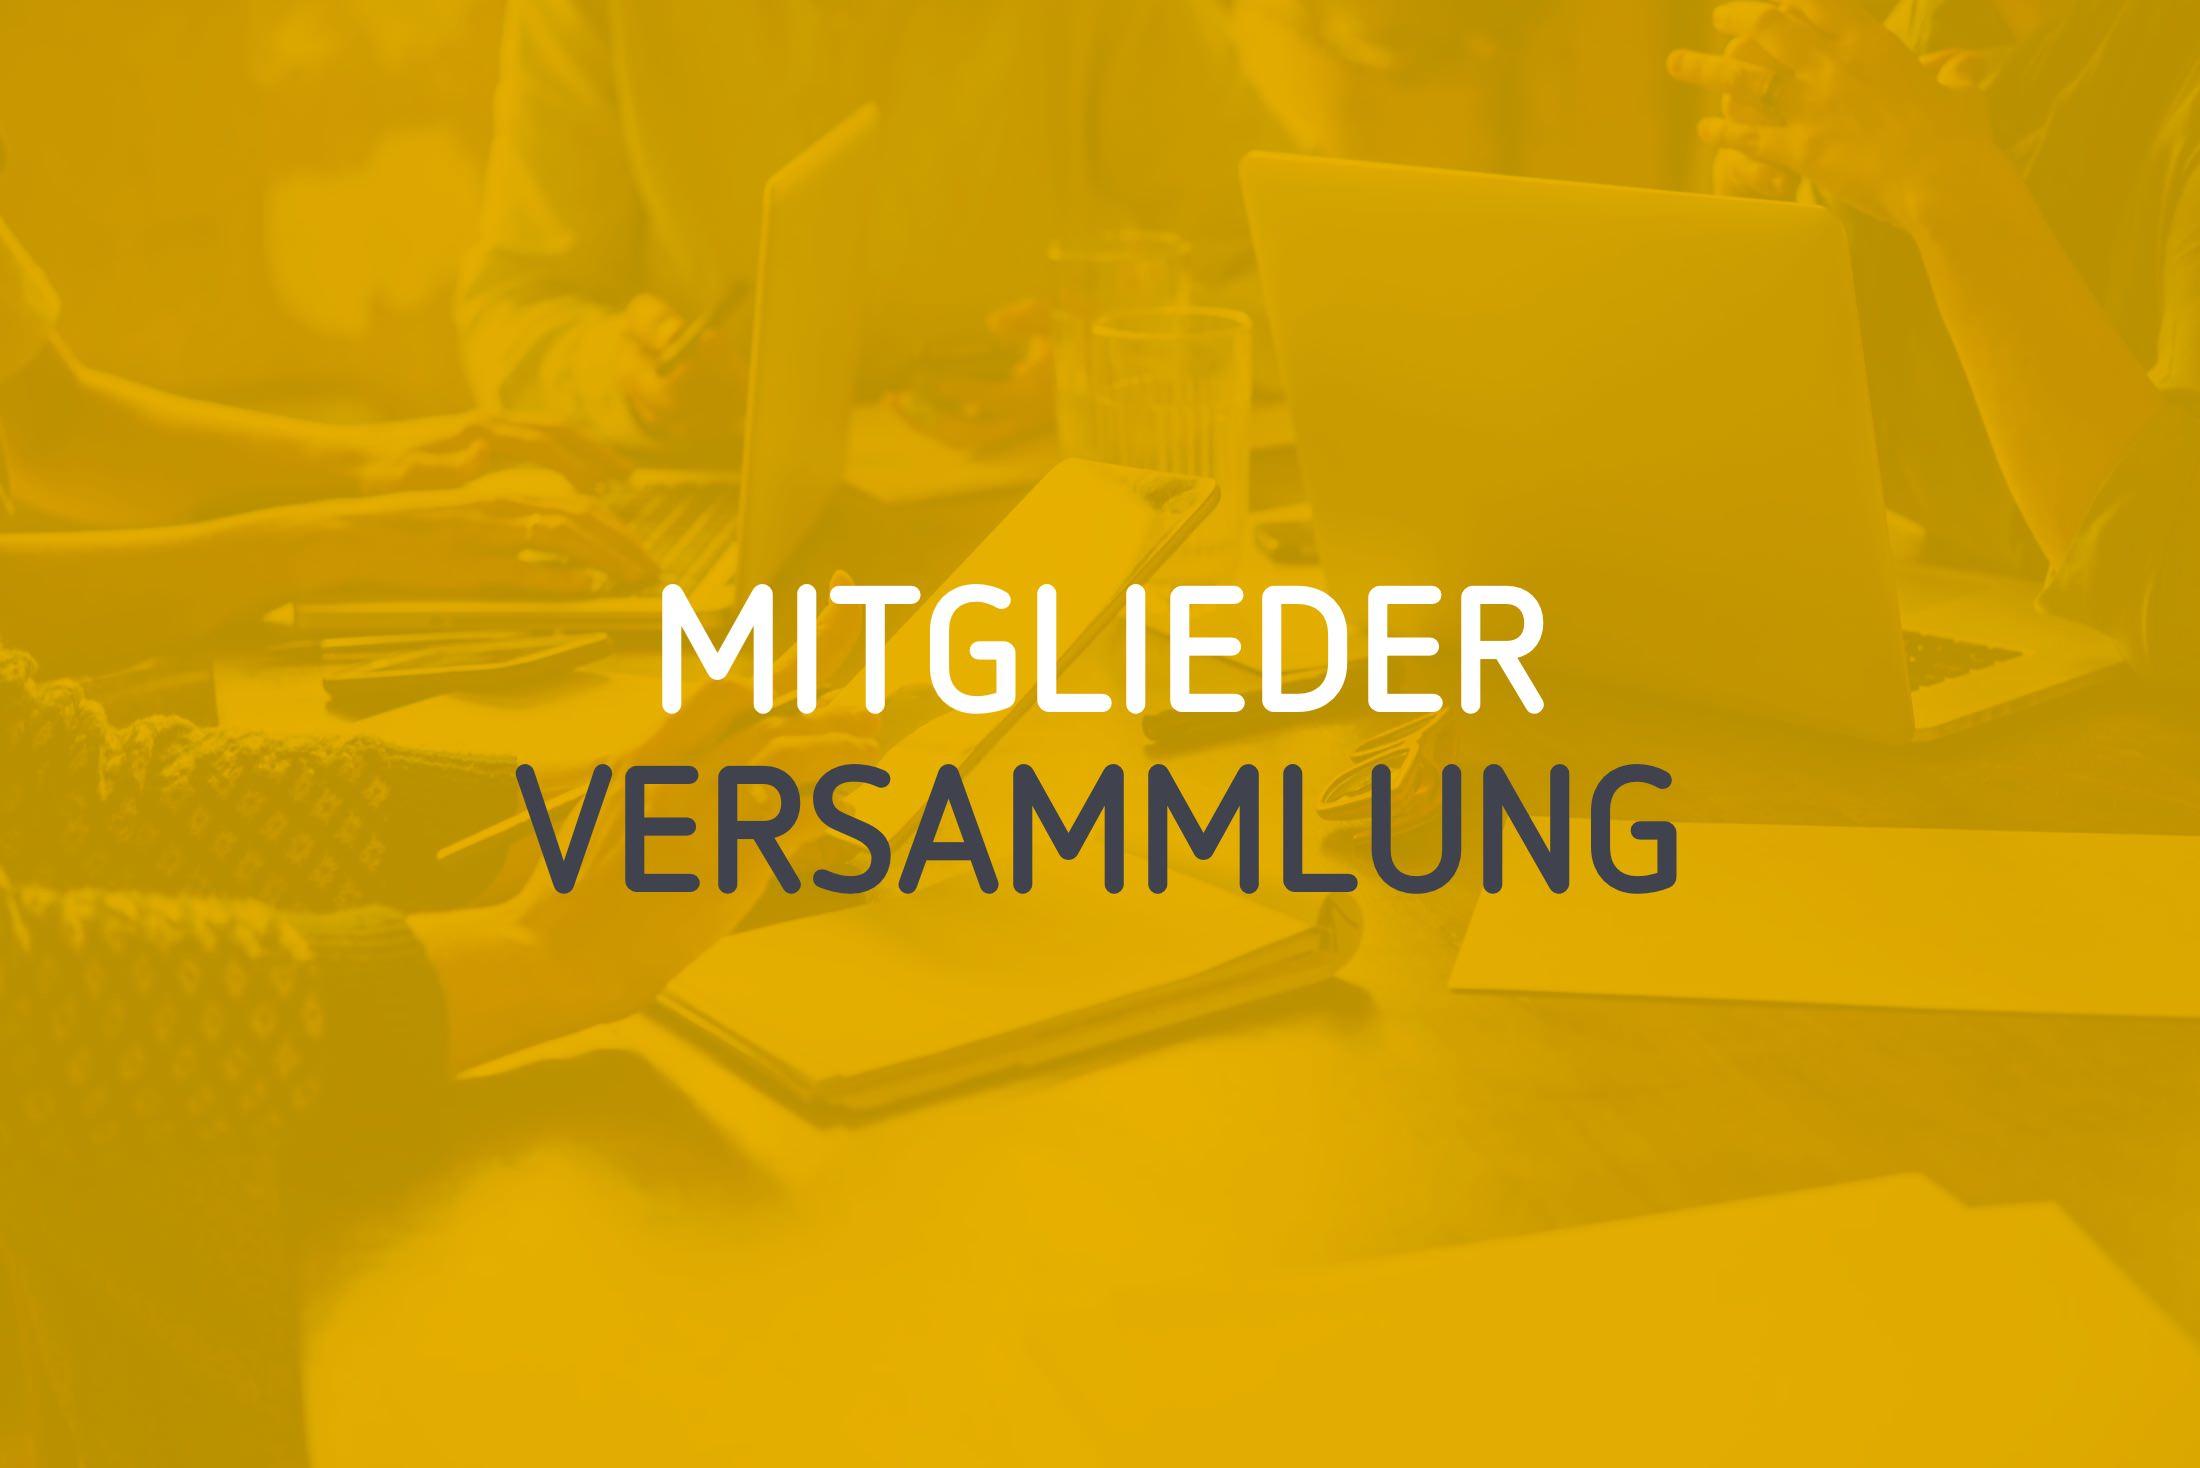 Mitgliederversammlung 2018 » IT Initiative Mecklenburg-Vorpommern e.V.